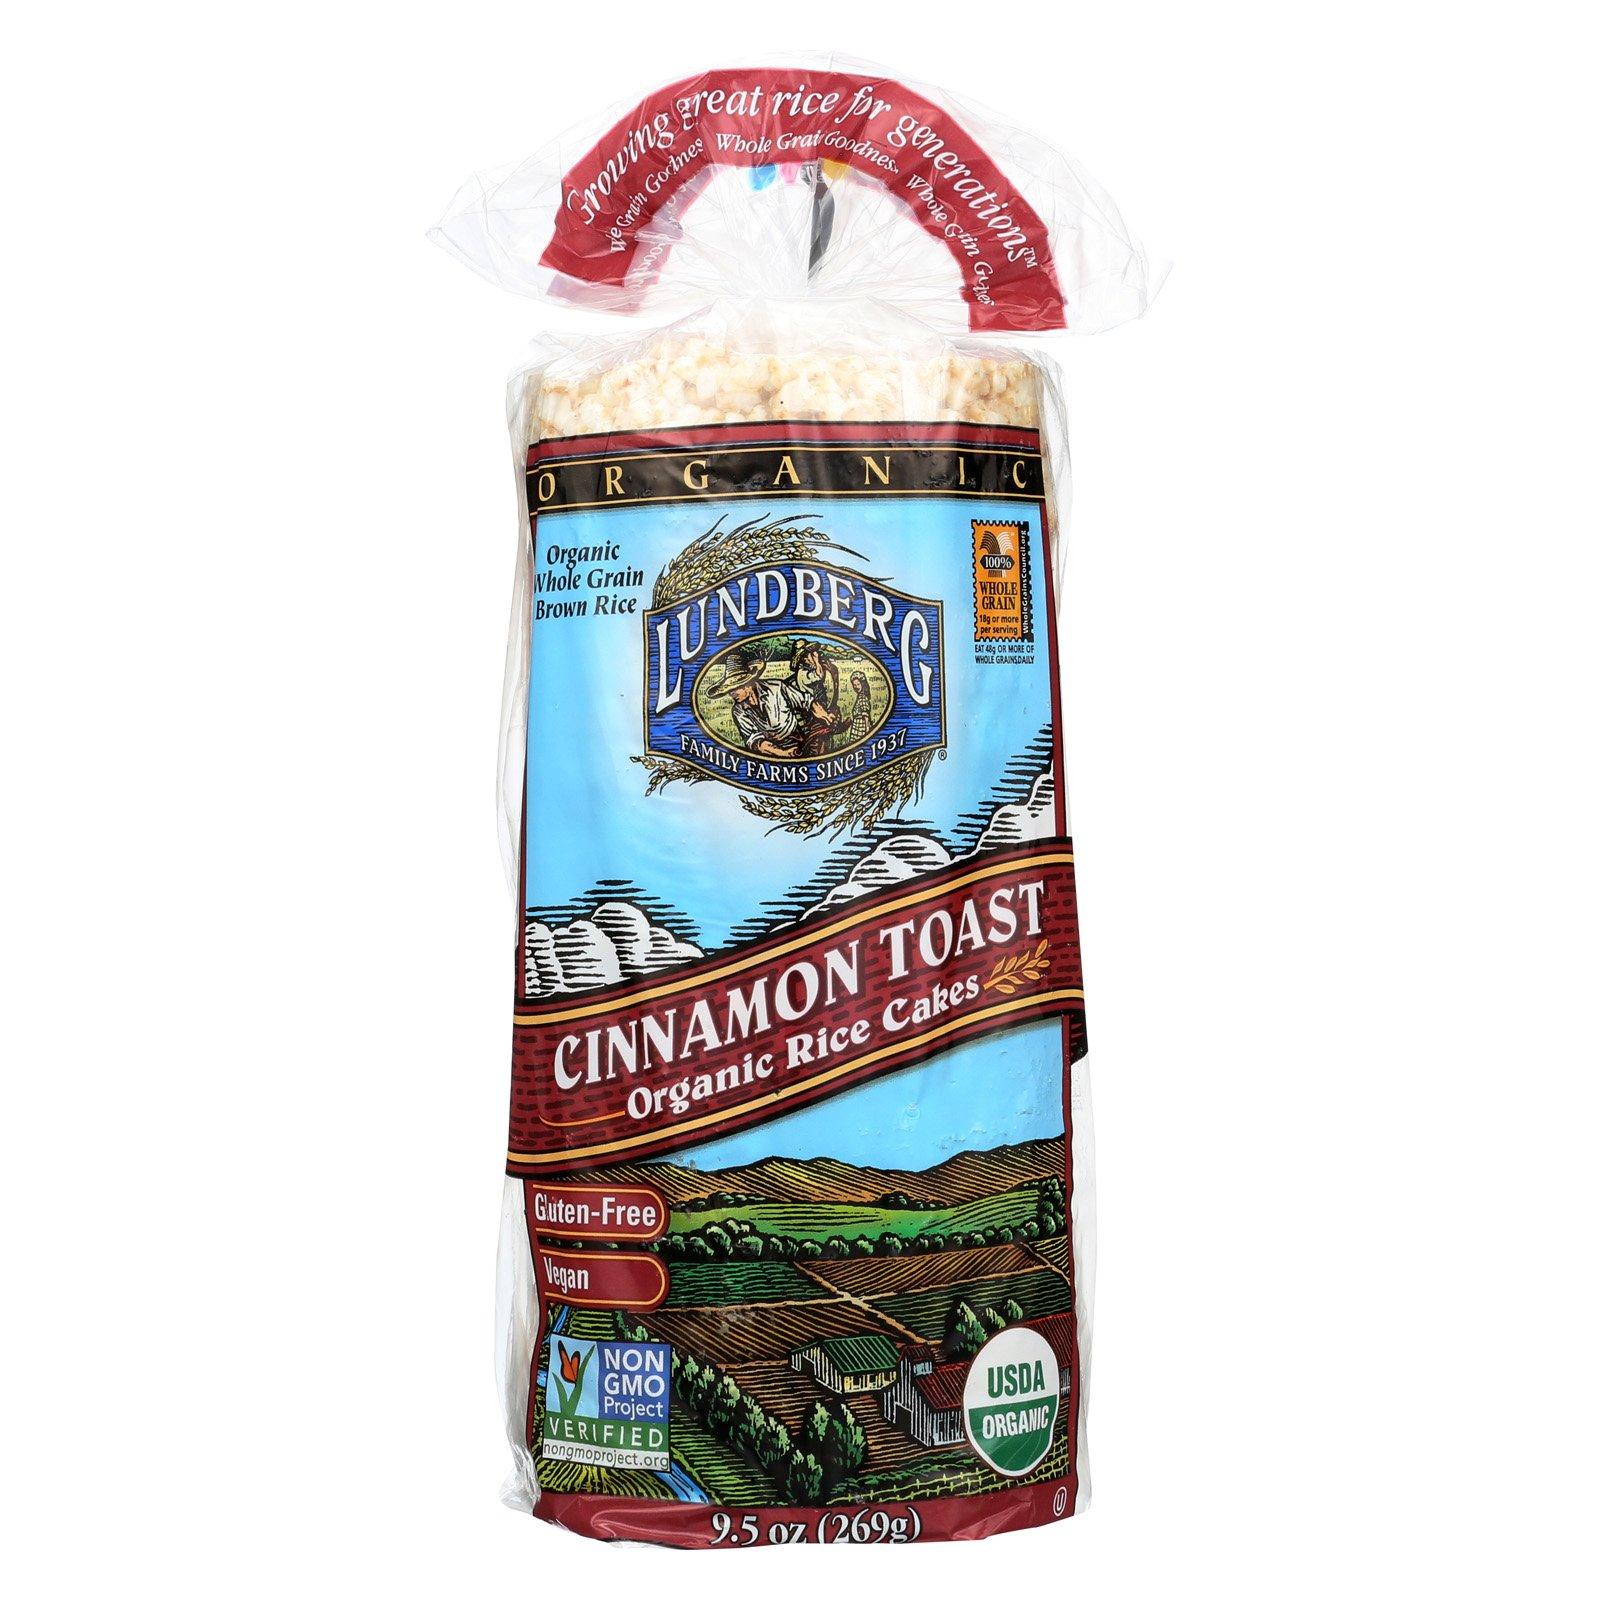 Lundberg Family Farms Organic Rice Cakes - Cinnamon Toast - Case of 12 - 9.5 oz.